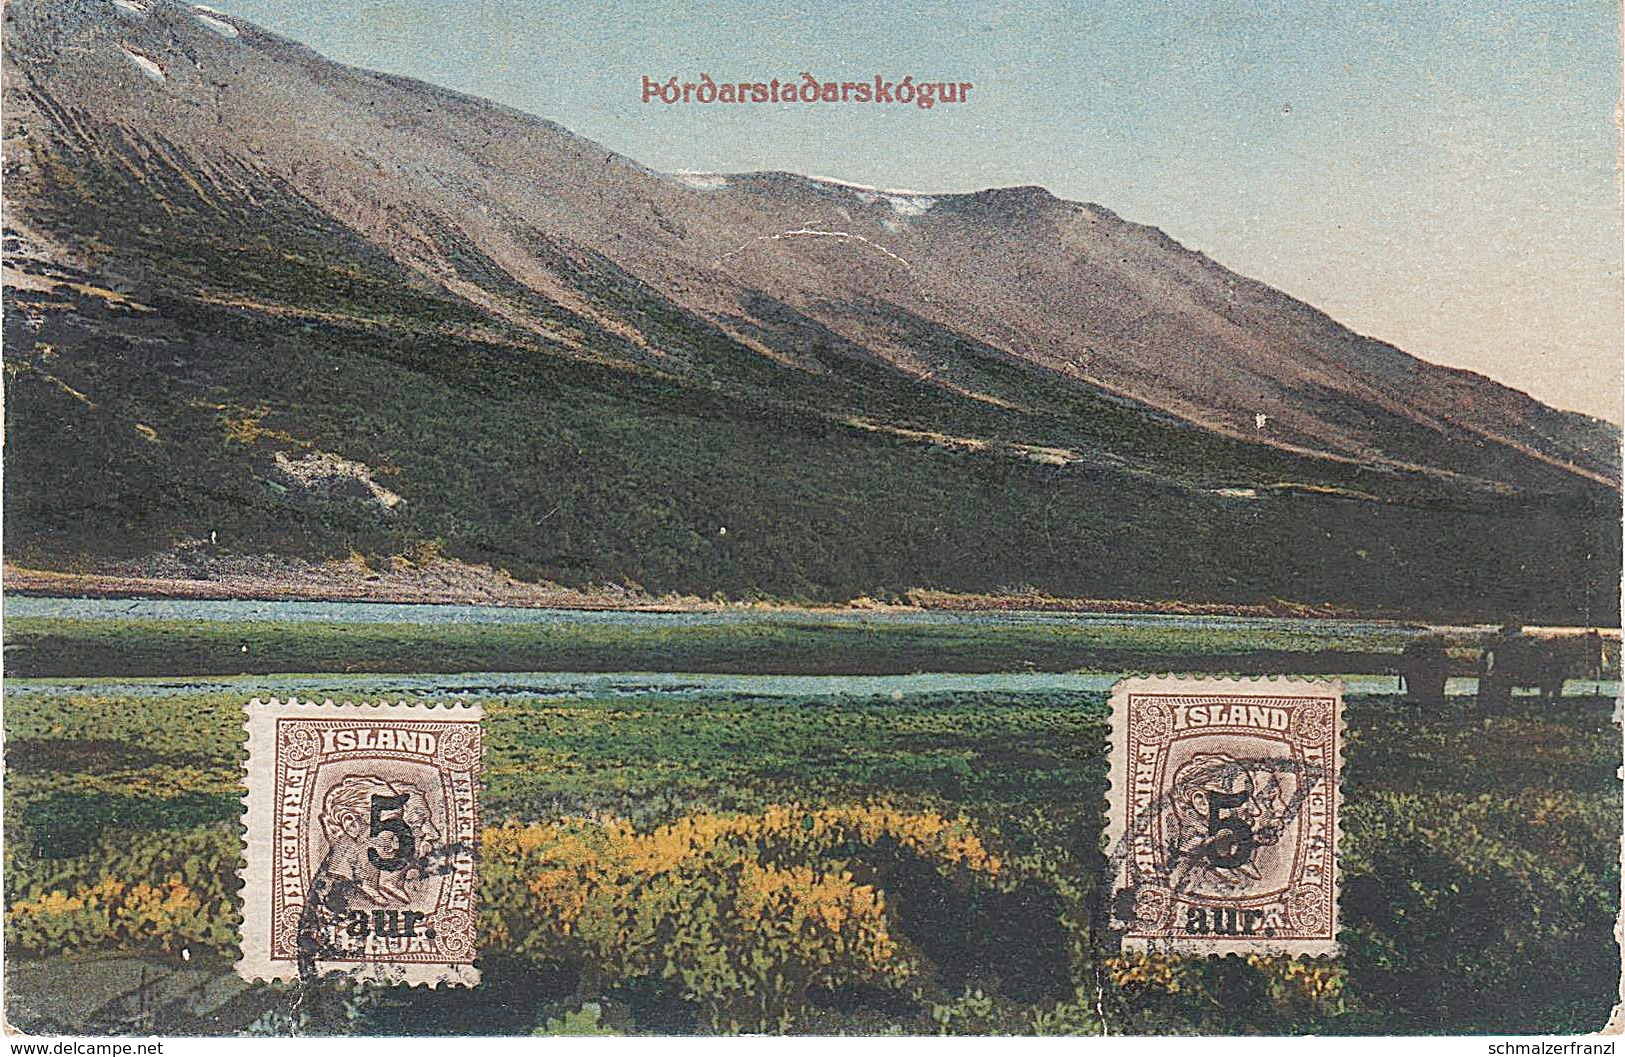 AK Pordarstadarskogur Iceland Island Islande A Reykjavik Stamp Timbre Briefmarke Stimpill Skandinavien Scandinavia - Islande